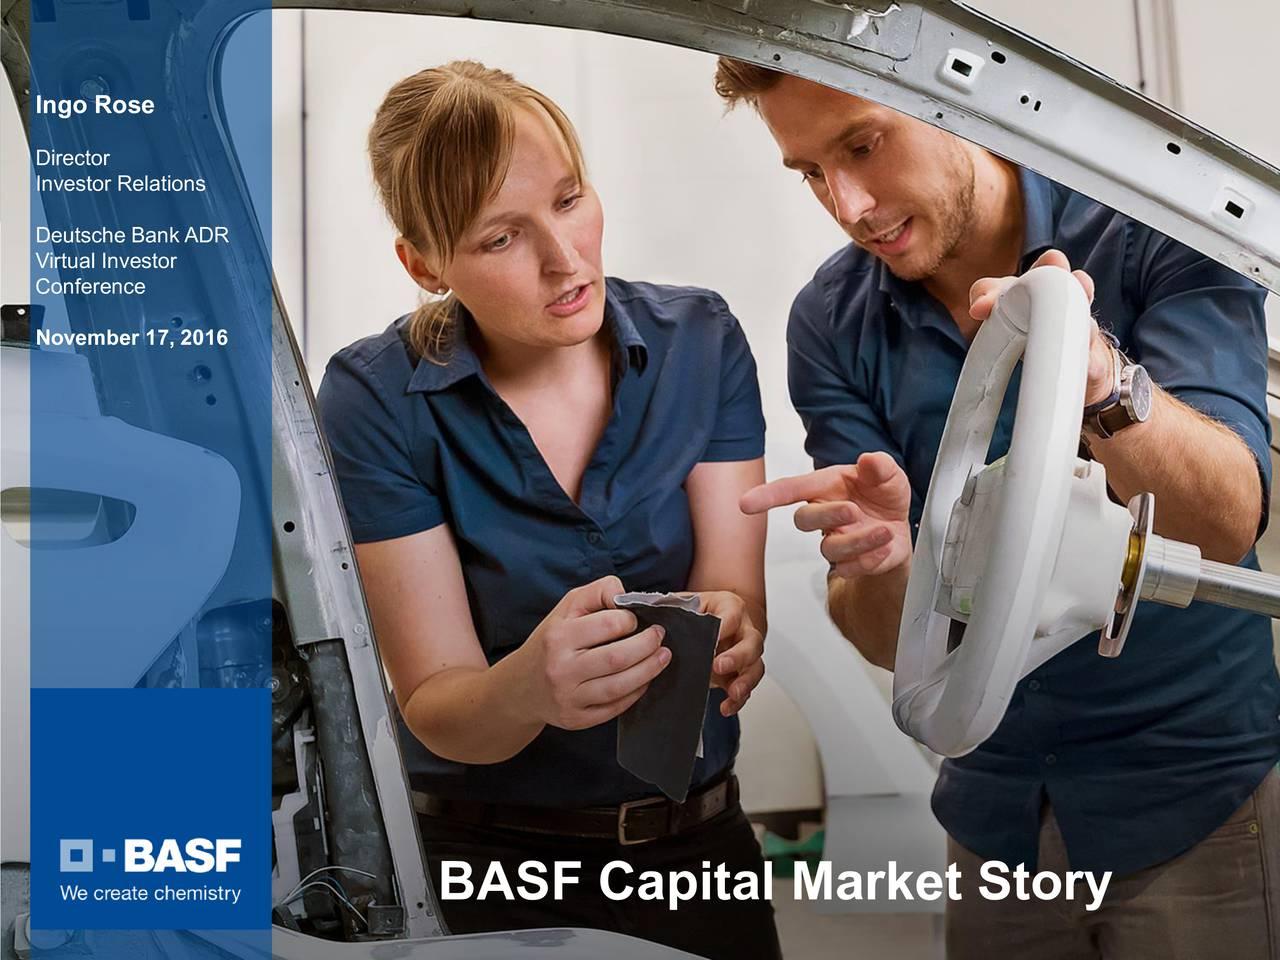 Director Investor Relations Deutsche Bank ADR Virtual Investor Conference November 17, 2016 BASF Capital Market Story BASF Capital Market Story, November 2016 1